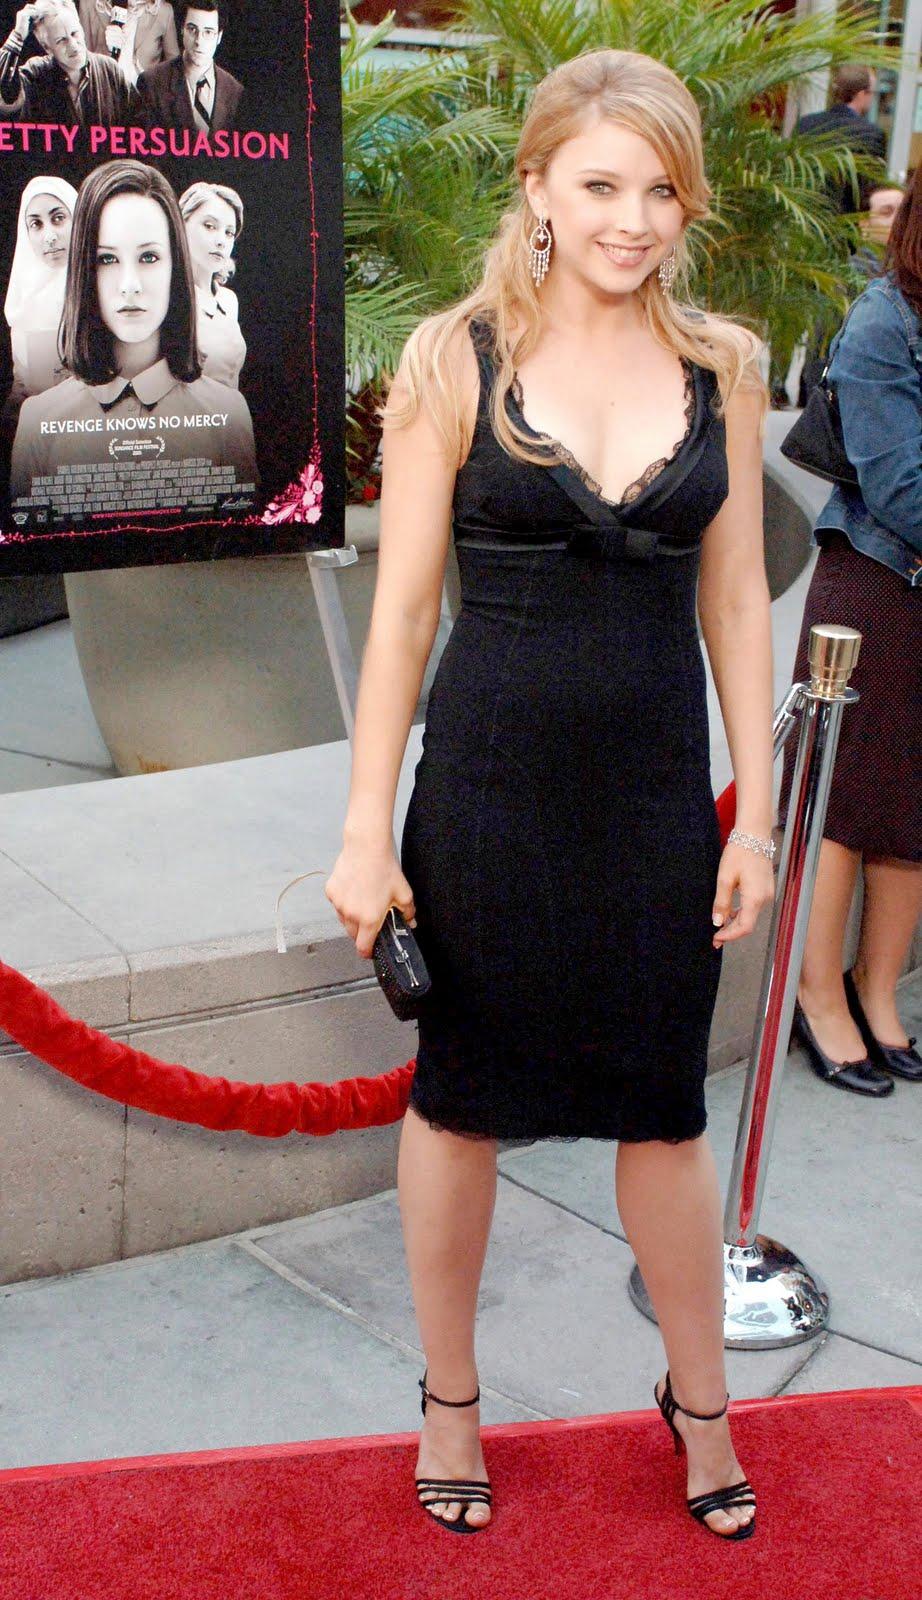 Nanda,Scott Bairstow Erotic archive Peyton List (actress, born 1998),Kristen Meadows